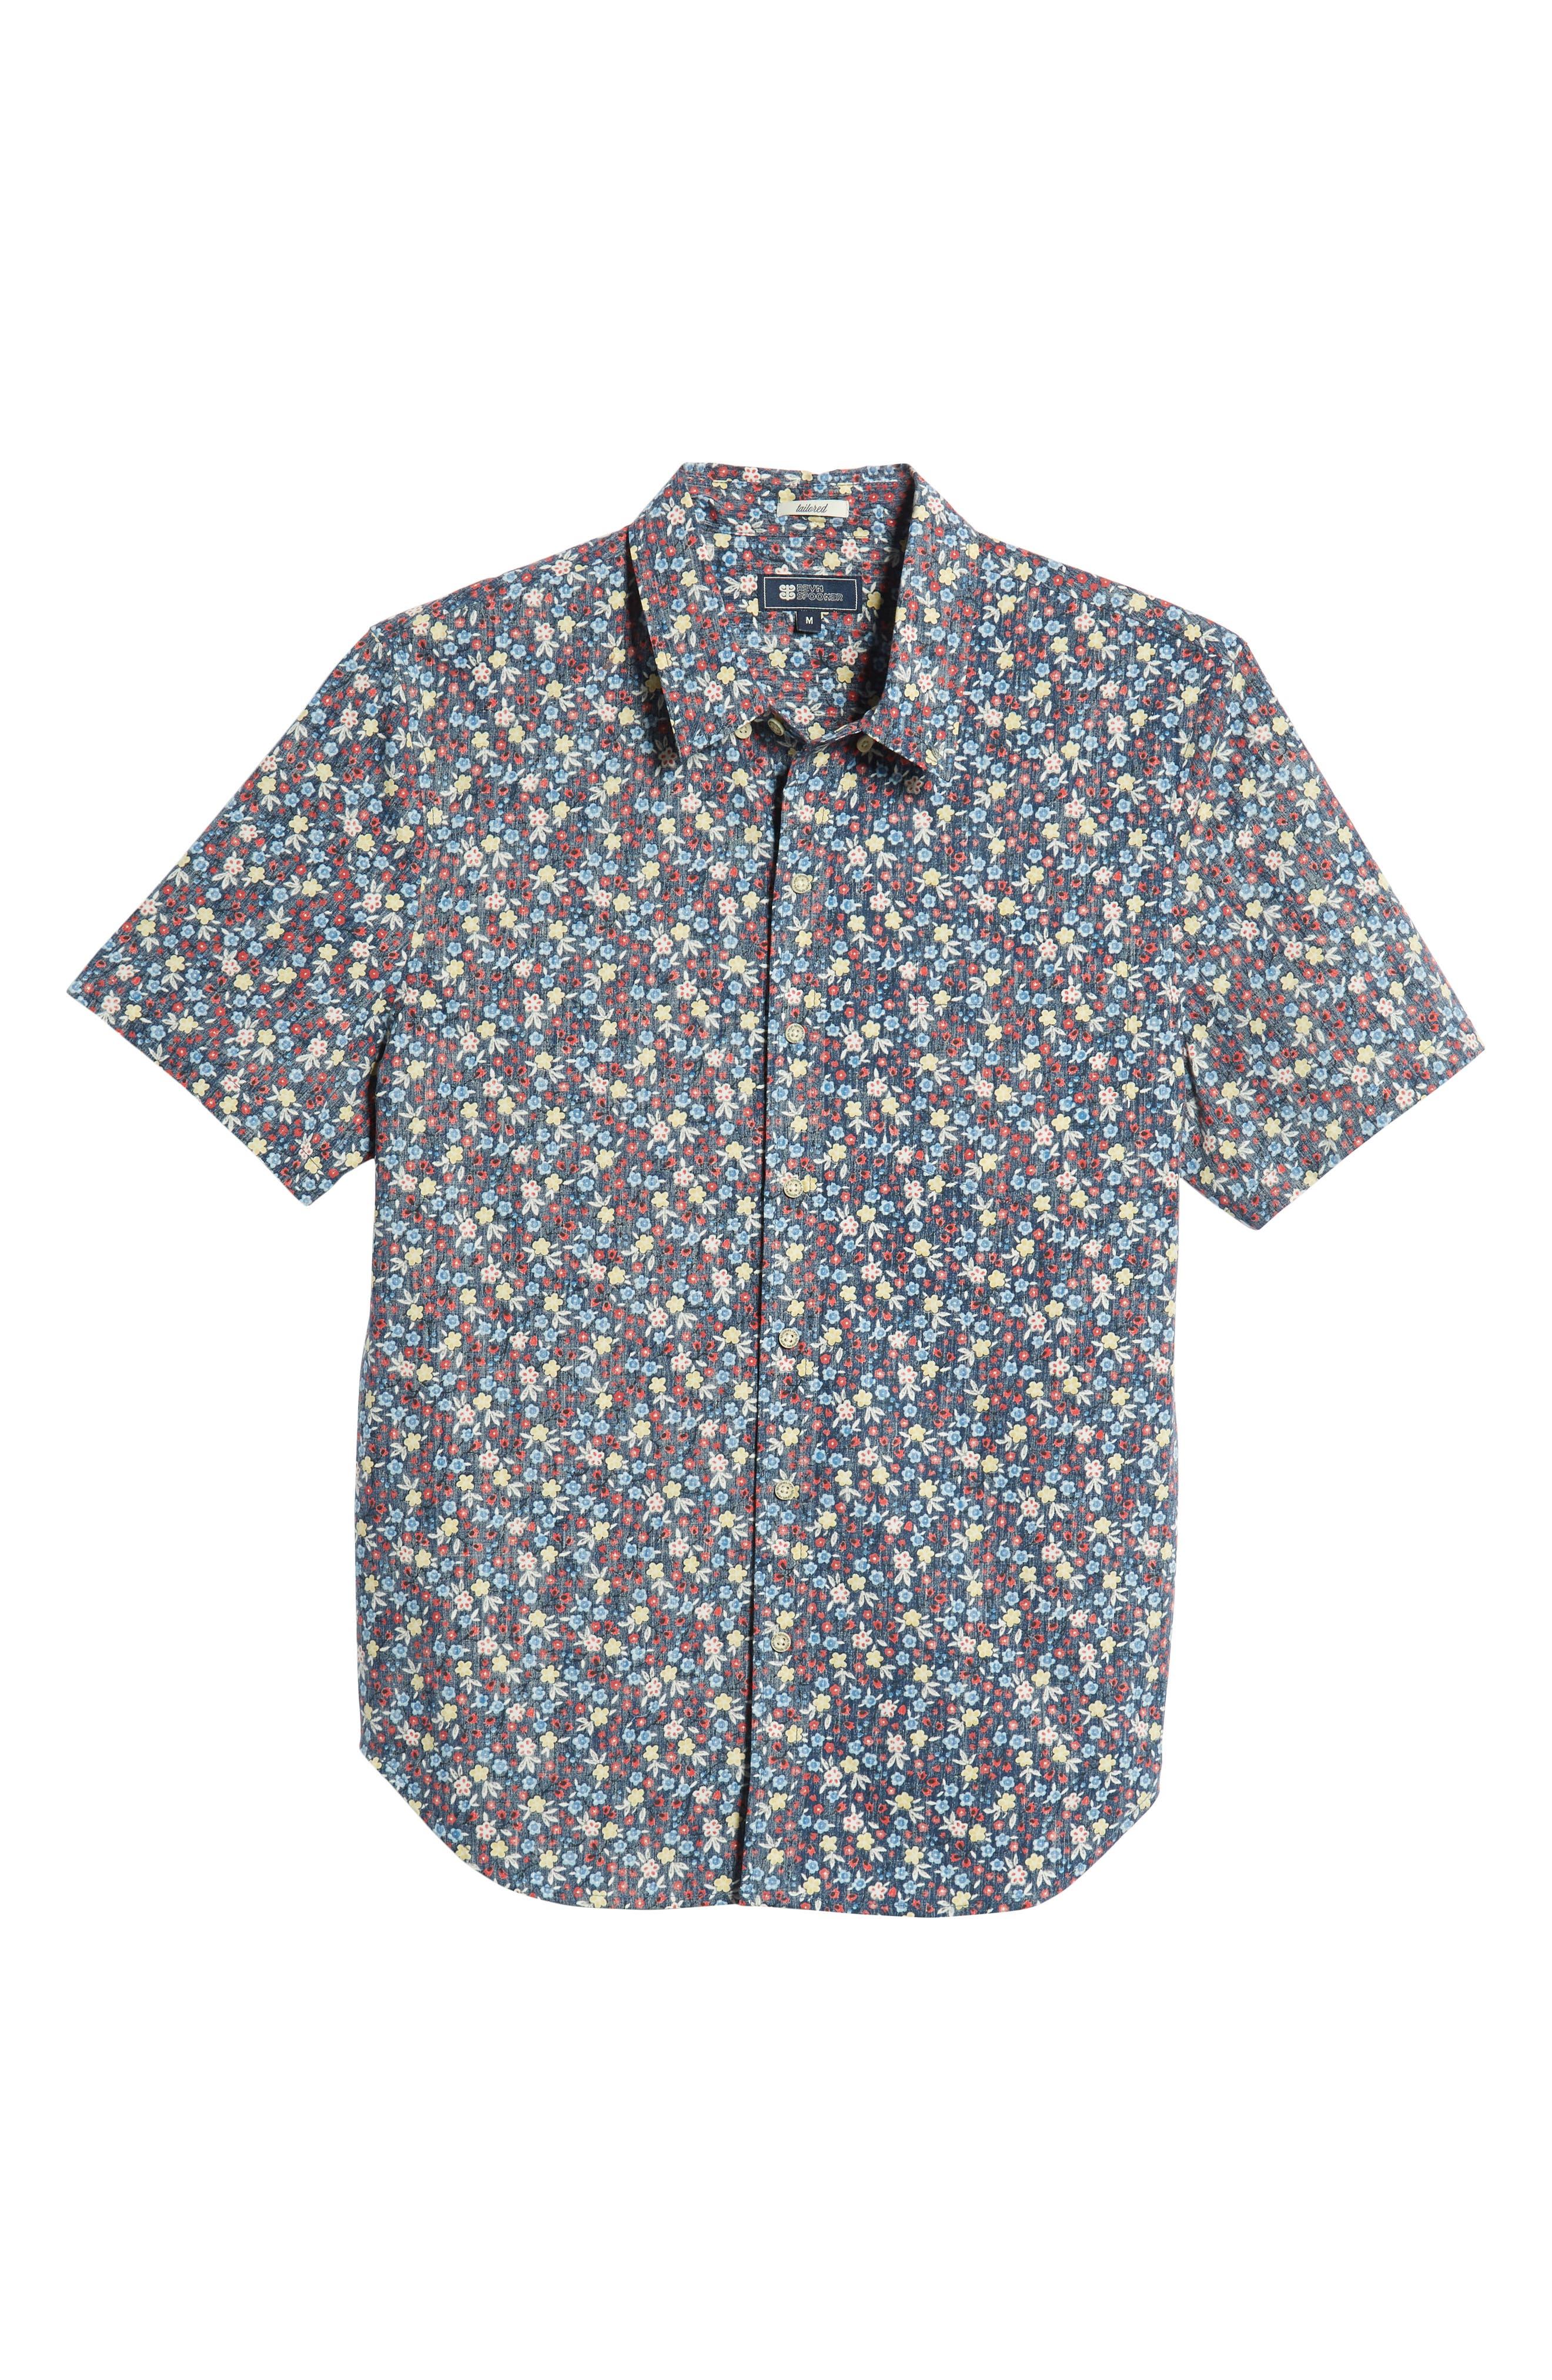 REYN SPOONER, Retro Tailored Fit Sport Shirt, Alternate thumbnail 5, color, MEDIEVAL BLUE